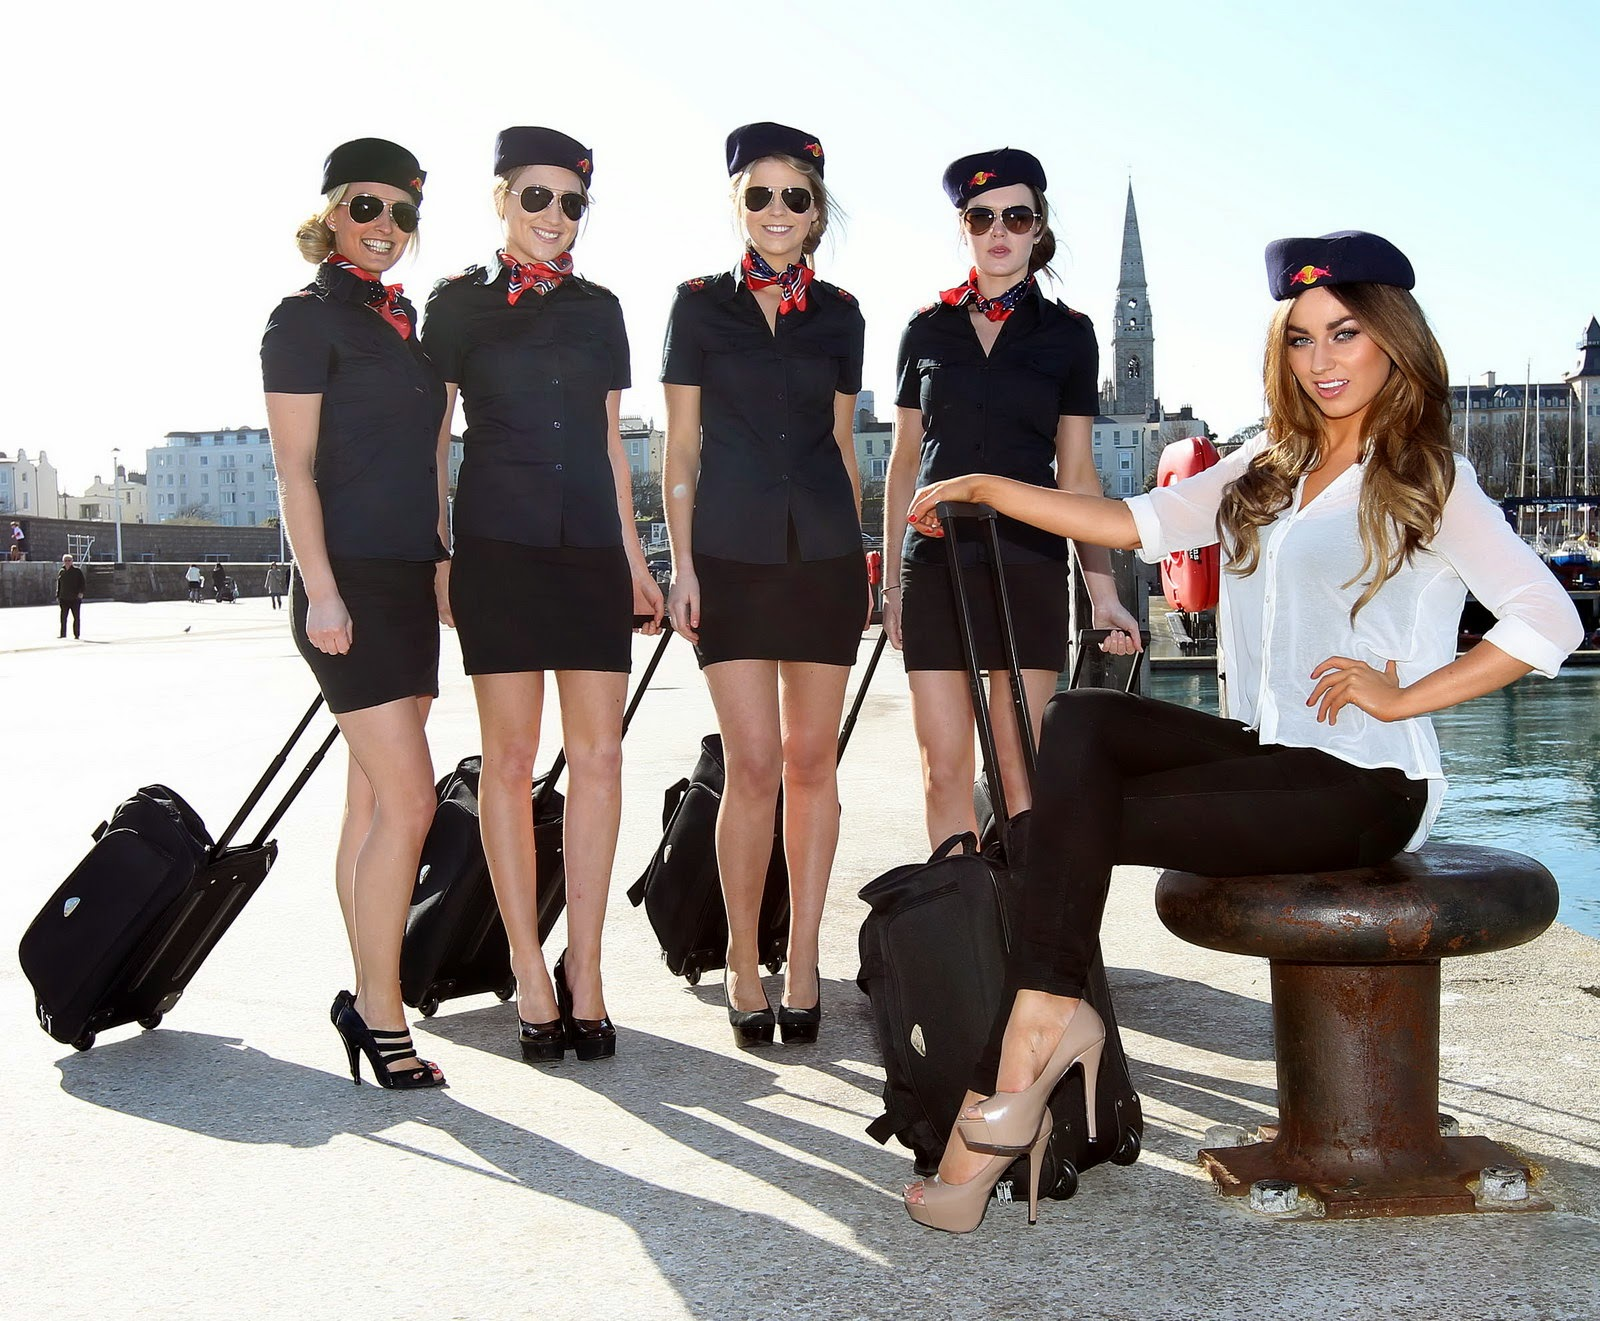 http://1.bp.blogspot.com/-MmRZoJY8nU0/To7PUPUlPpI/AAAAAAAAGxs/TAmdN96EaV4/s1600/Red+bull+flugtag+stewardess+costume+_10.jpg